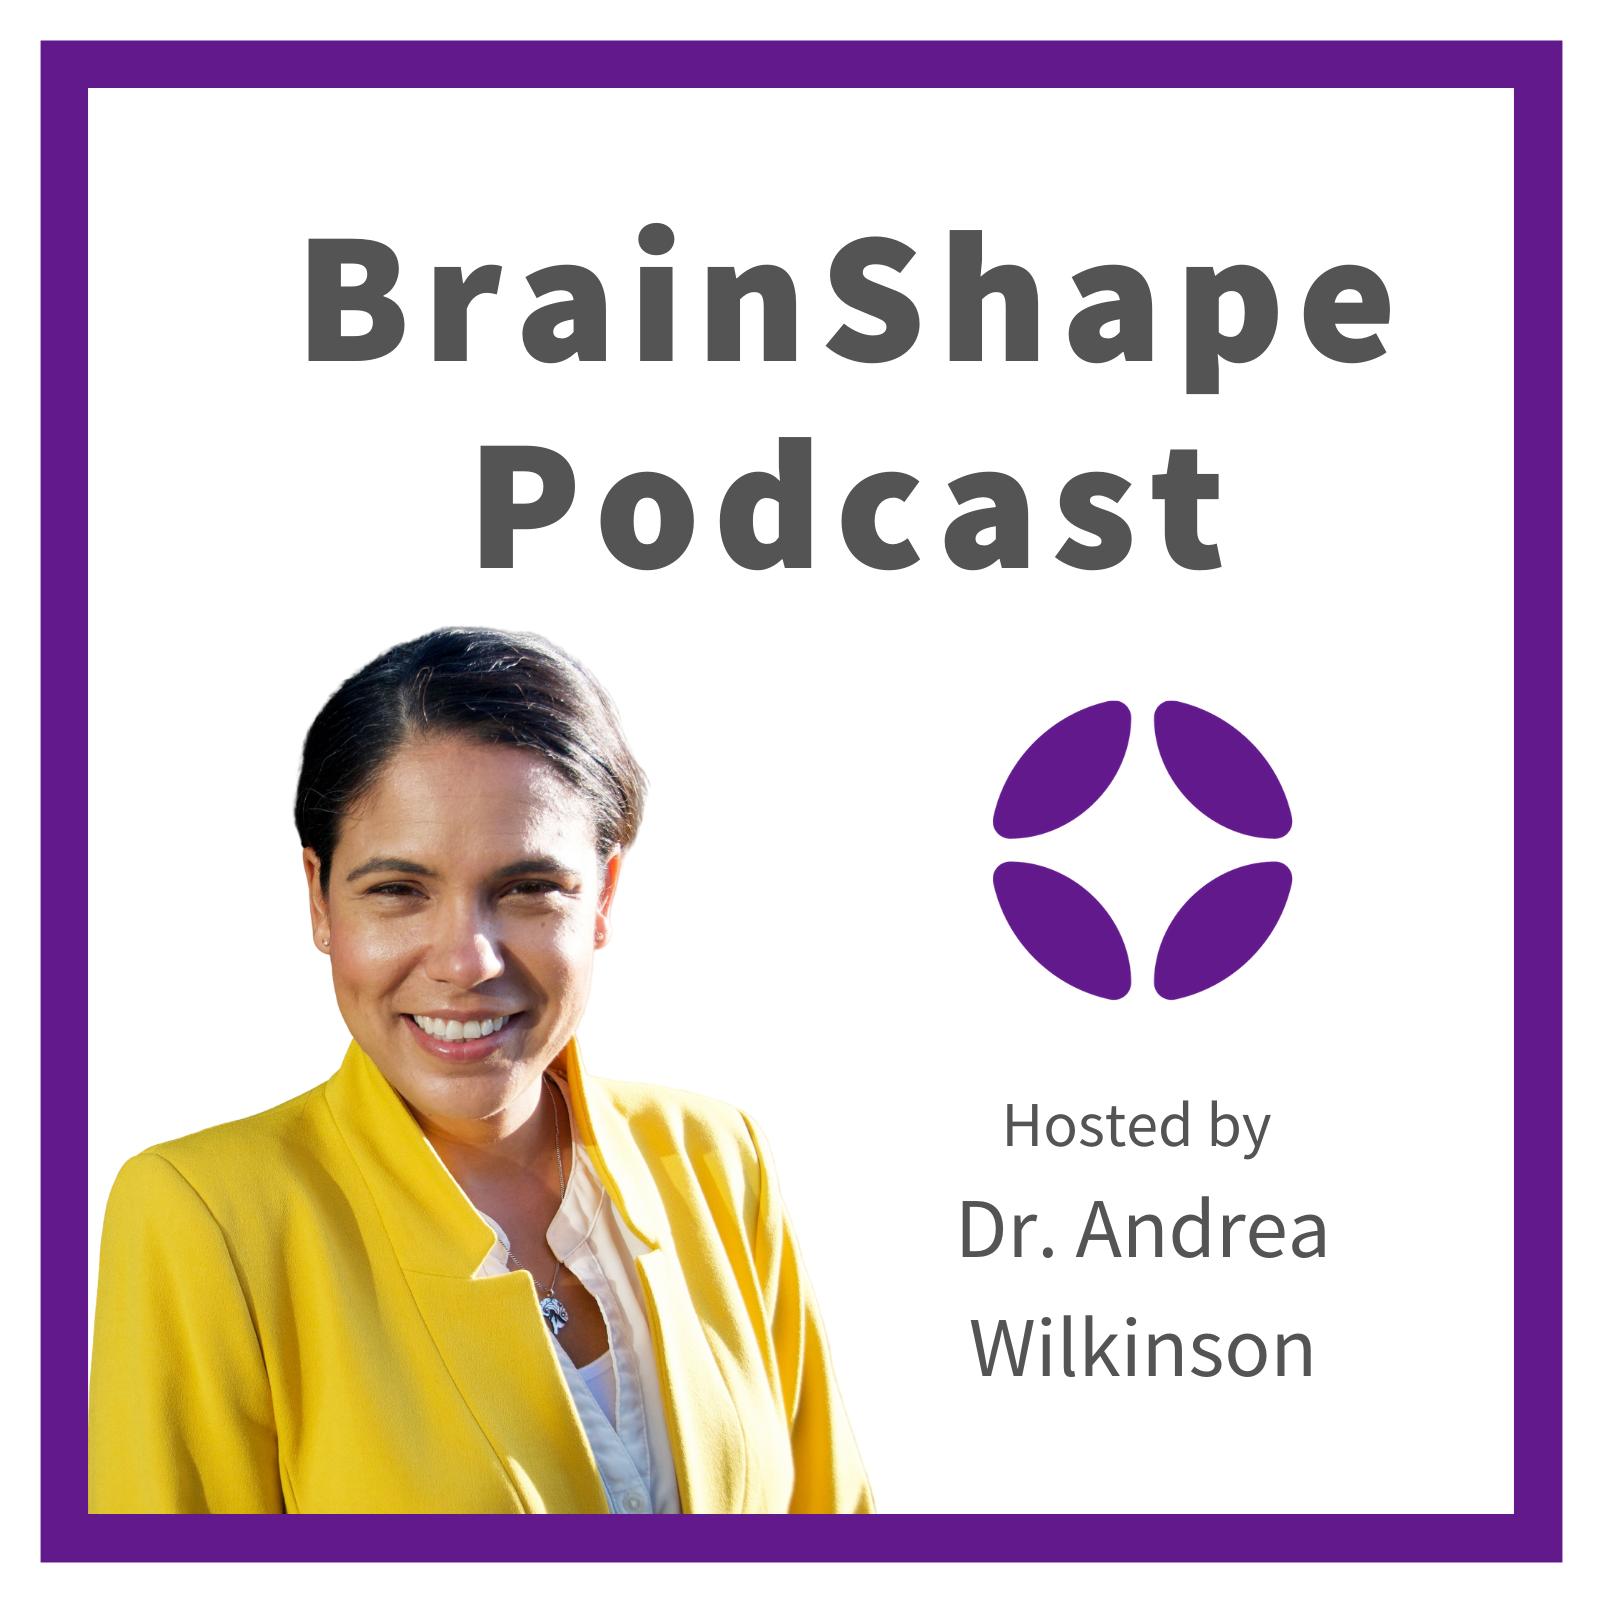 BrainShape Podcast show art